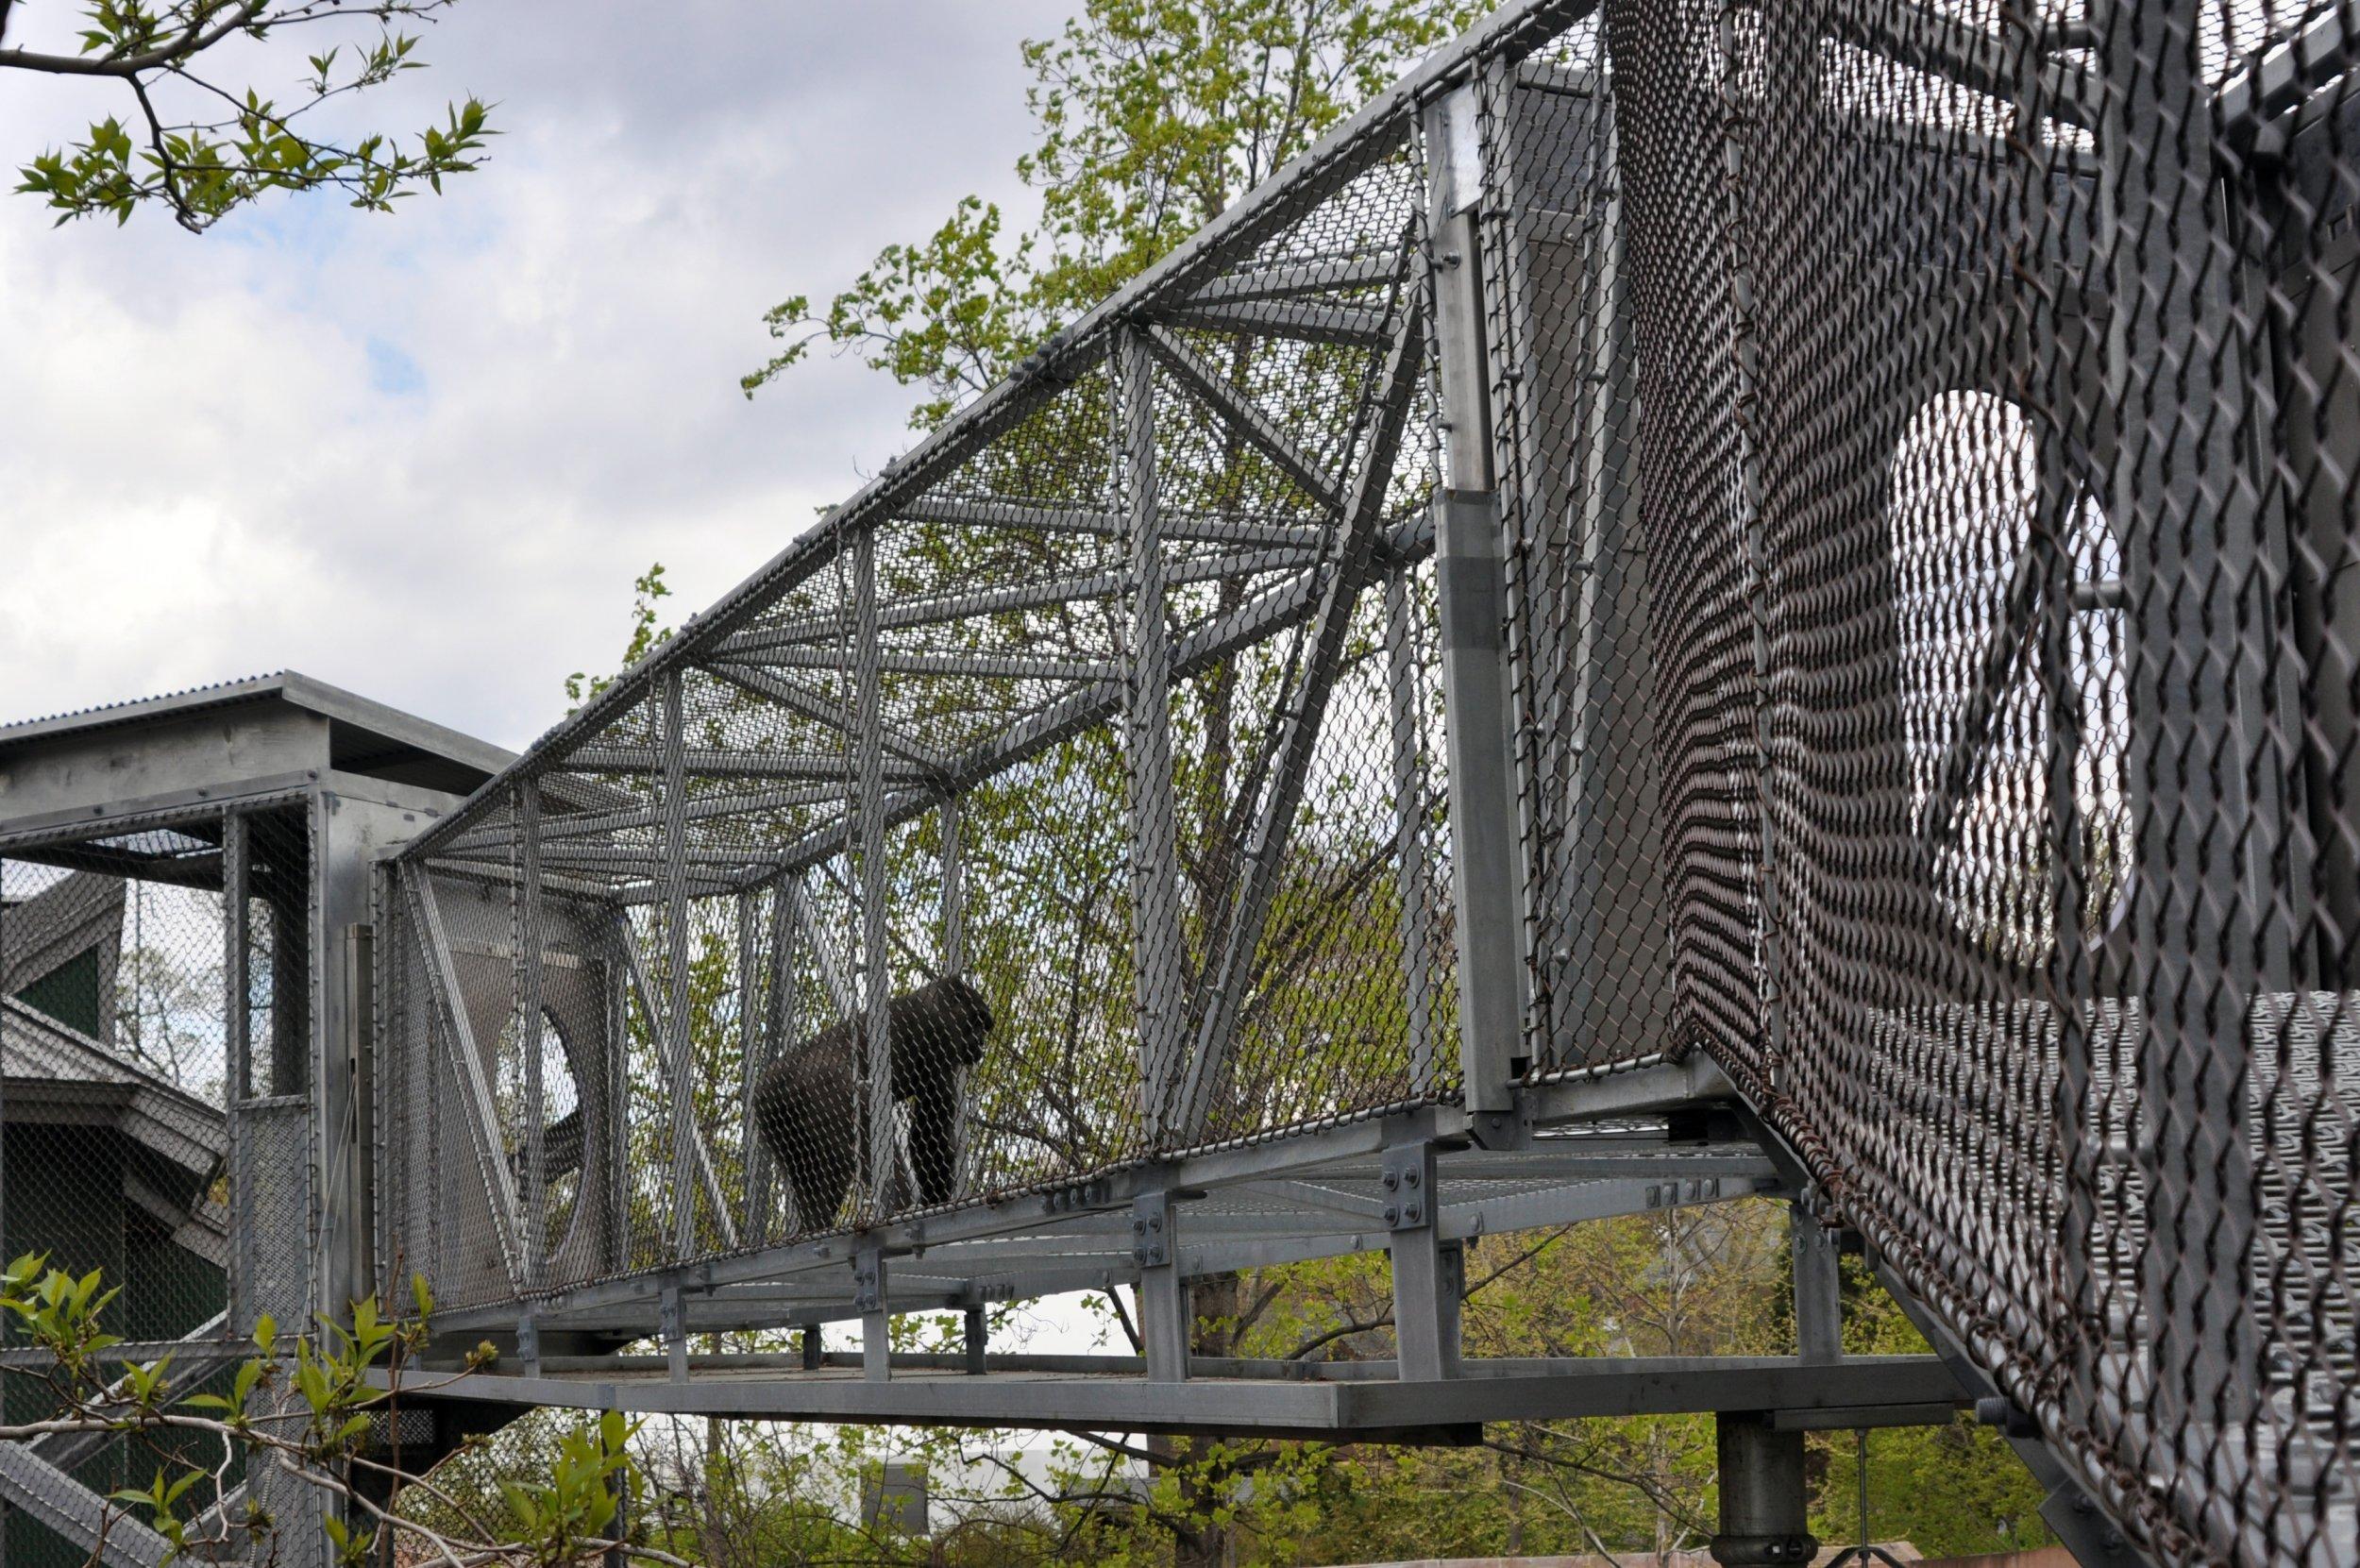 philadelphia zoo gorilla